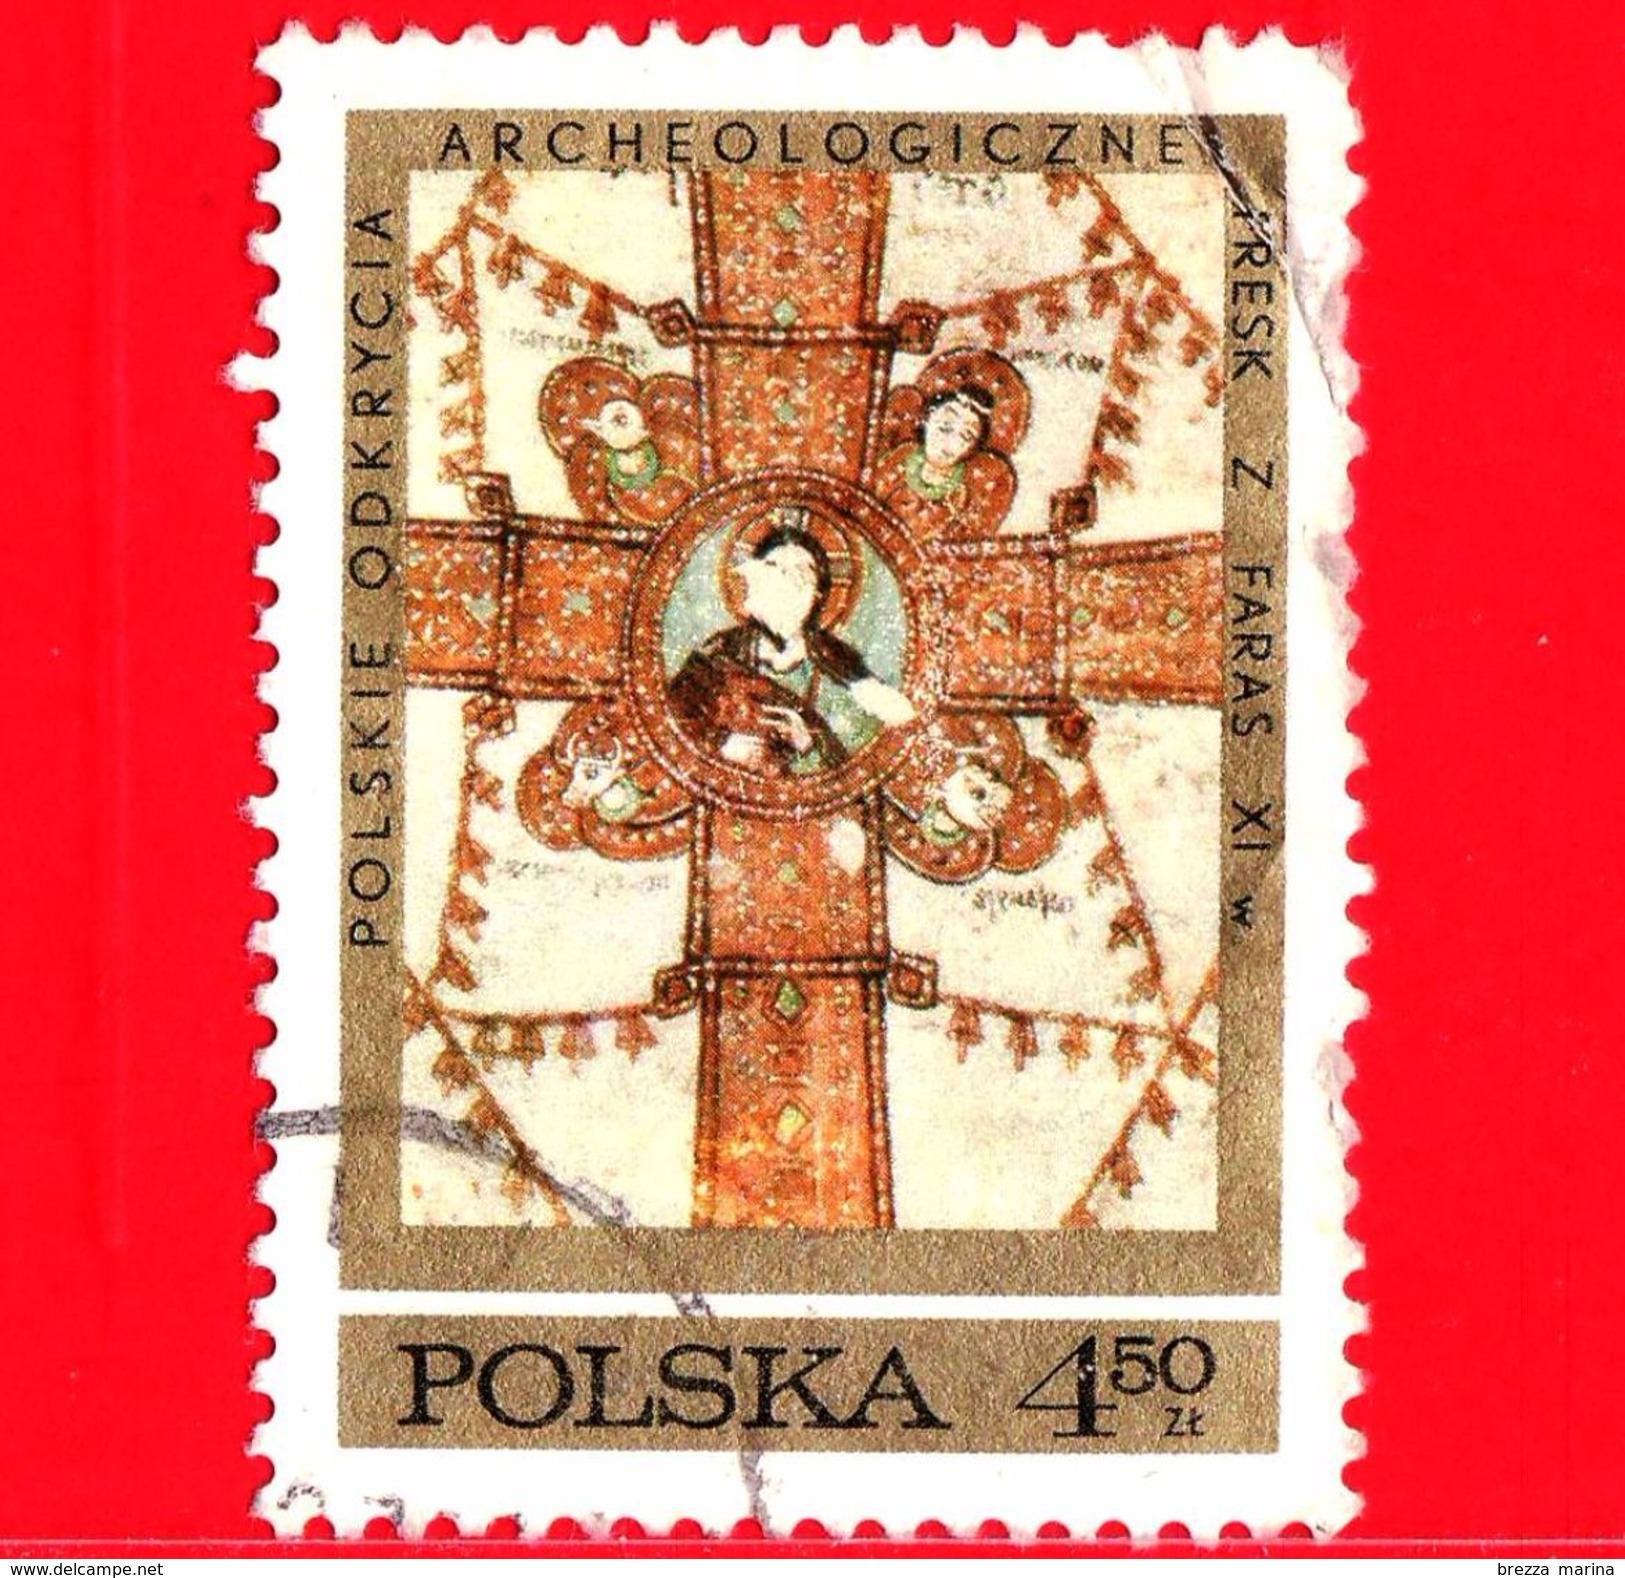 POLONIA - POLSKA - Usato - 1971 - Archeologia - Scavi Archeologici Polacchi In Nubia - Croce - Evangelisti - 4.50 - 1944-.... Republik